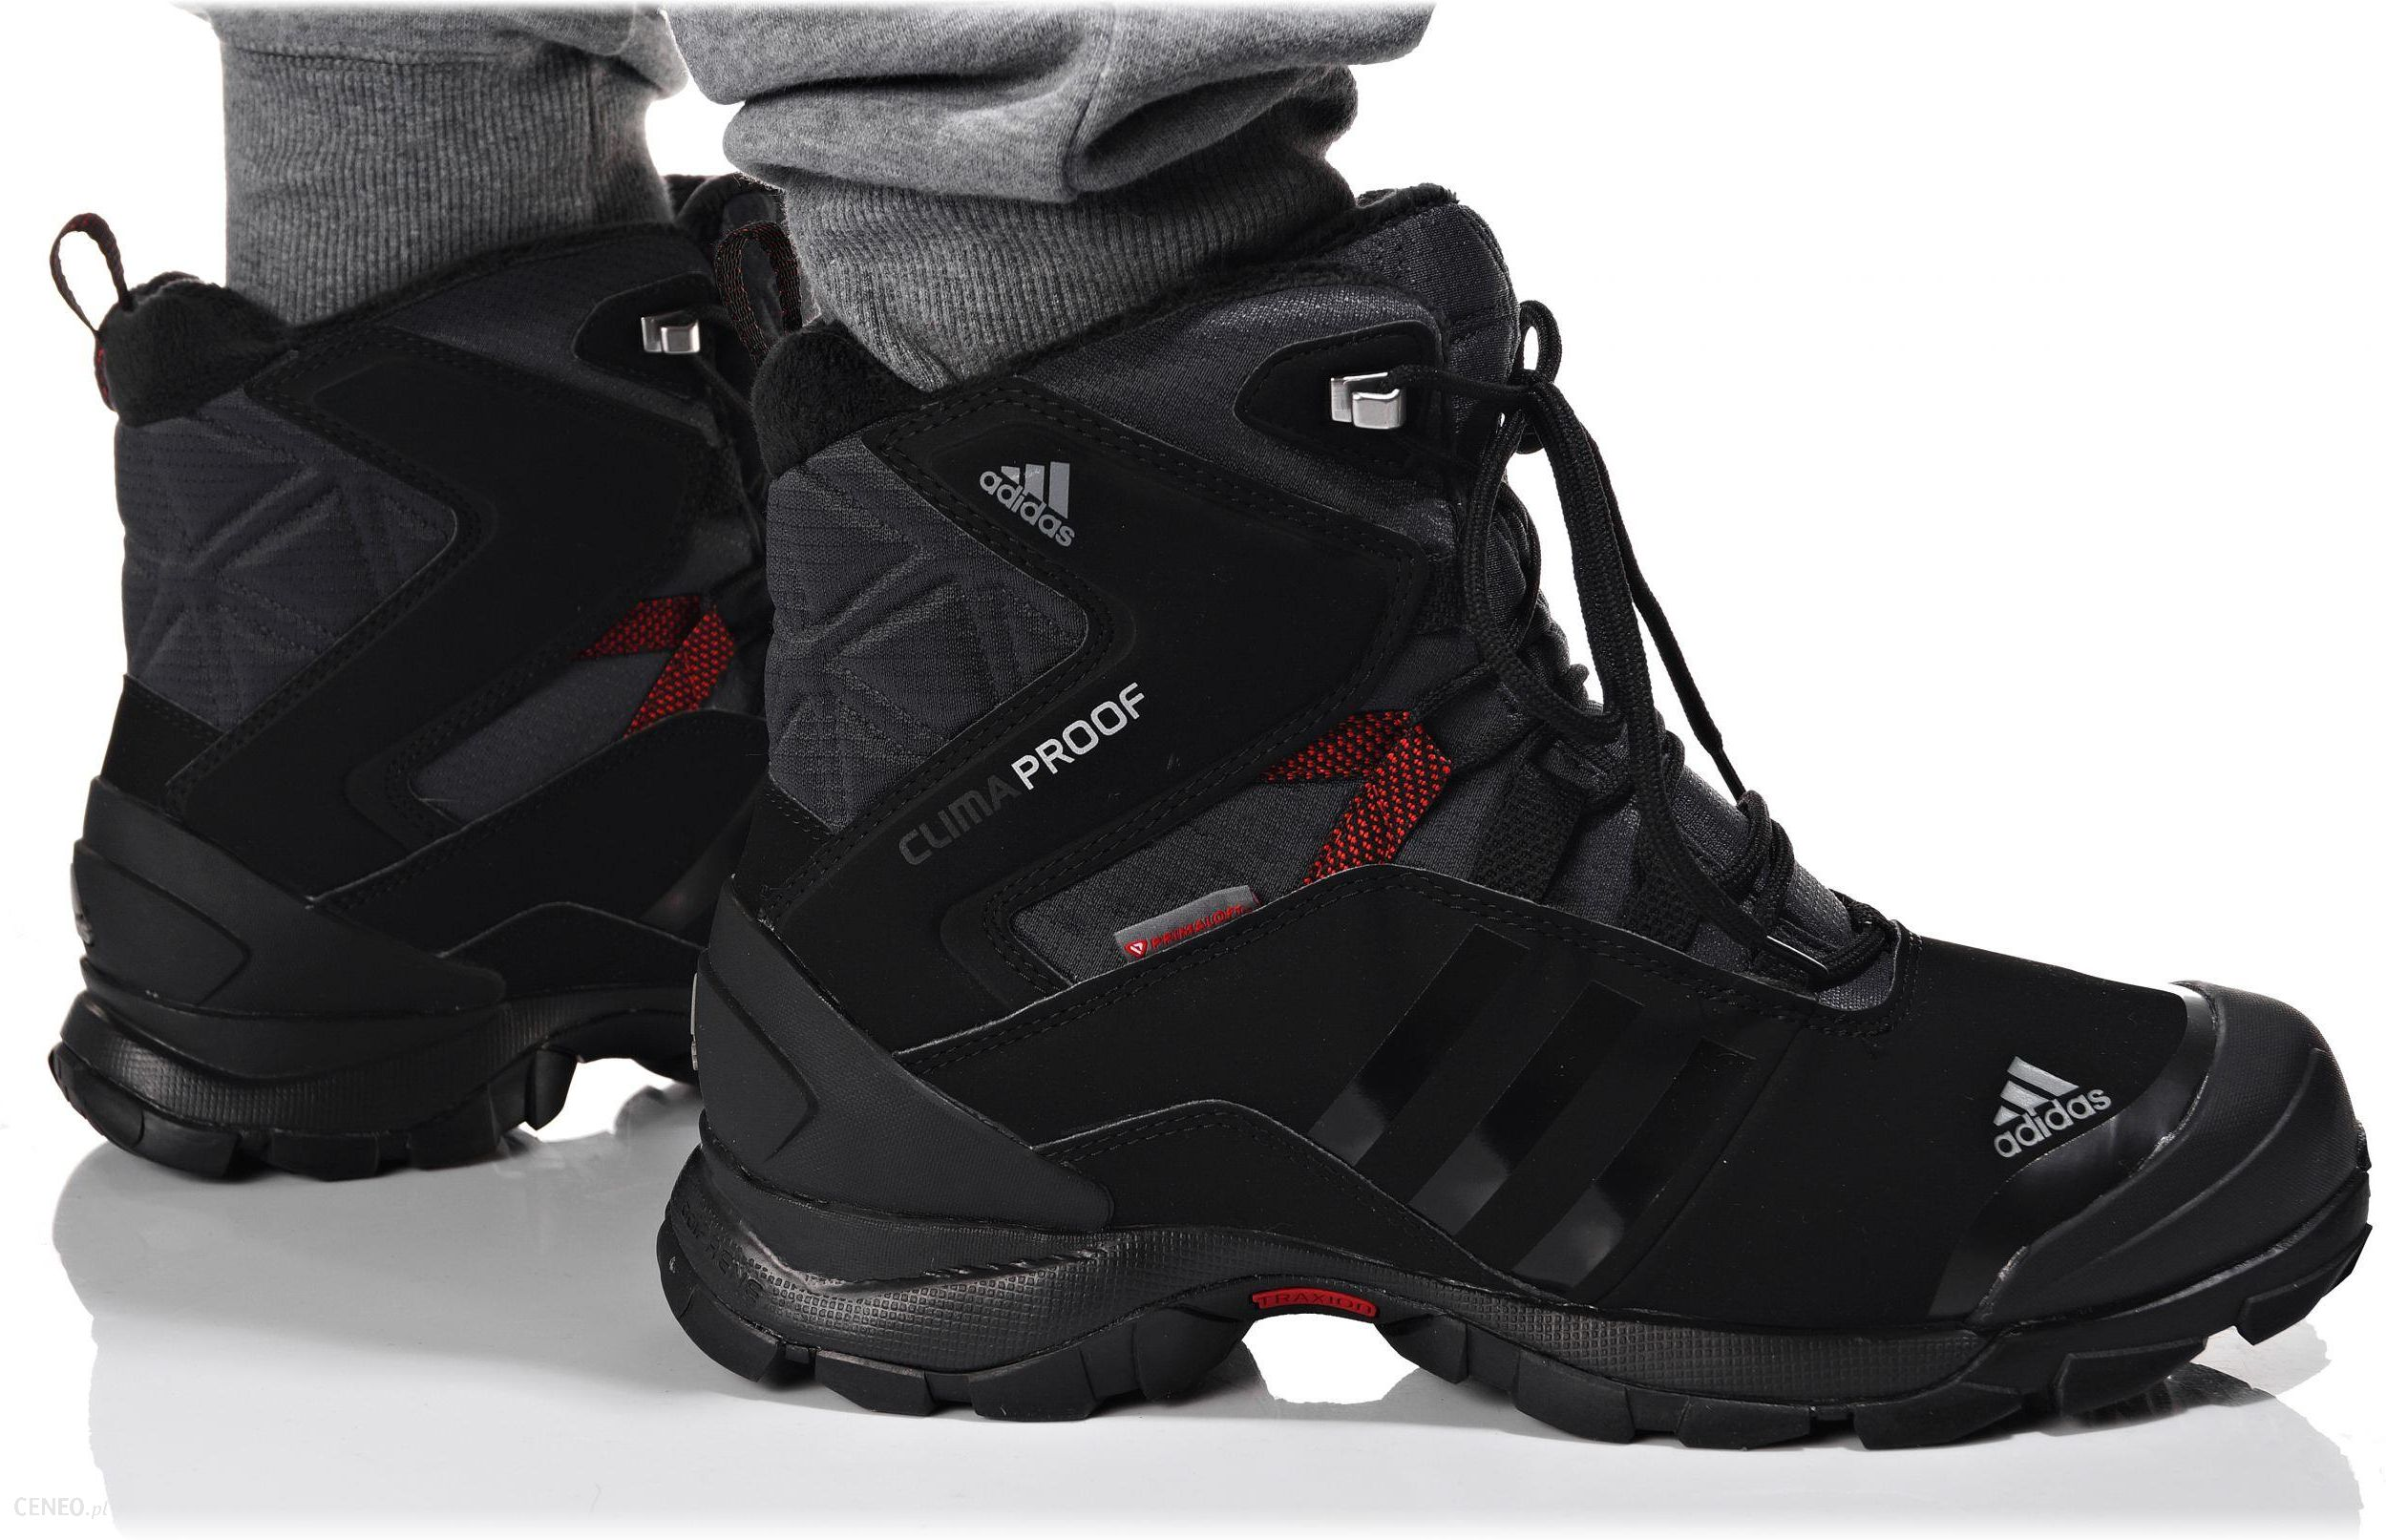 Buty Adidas WINTER HIKER SPEED CP PL (V22179)